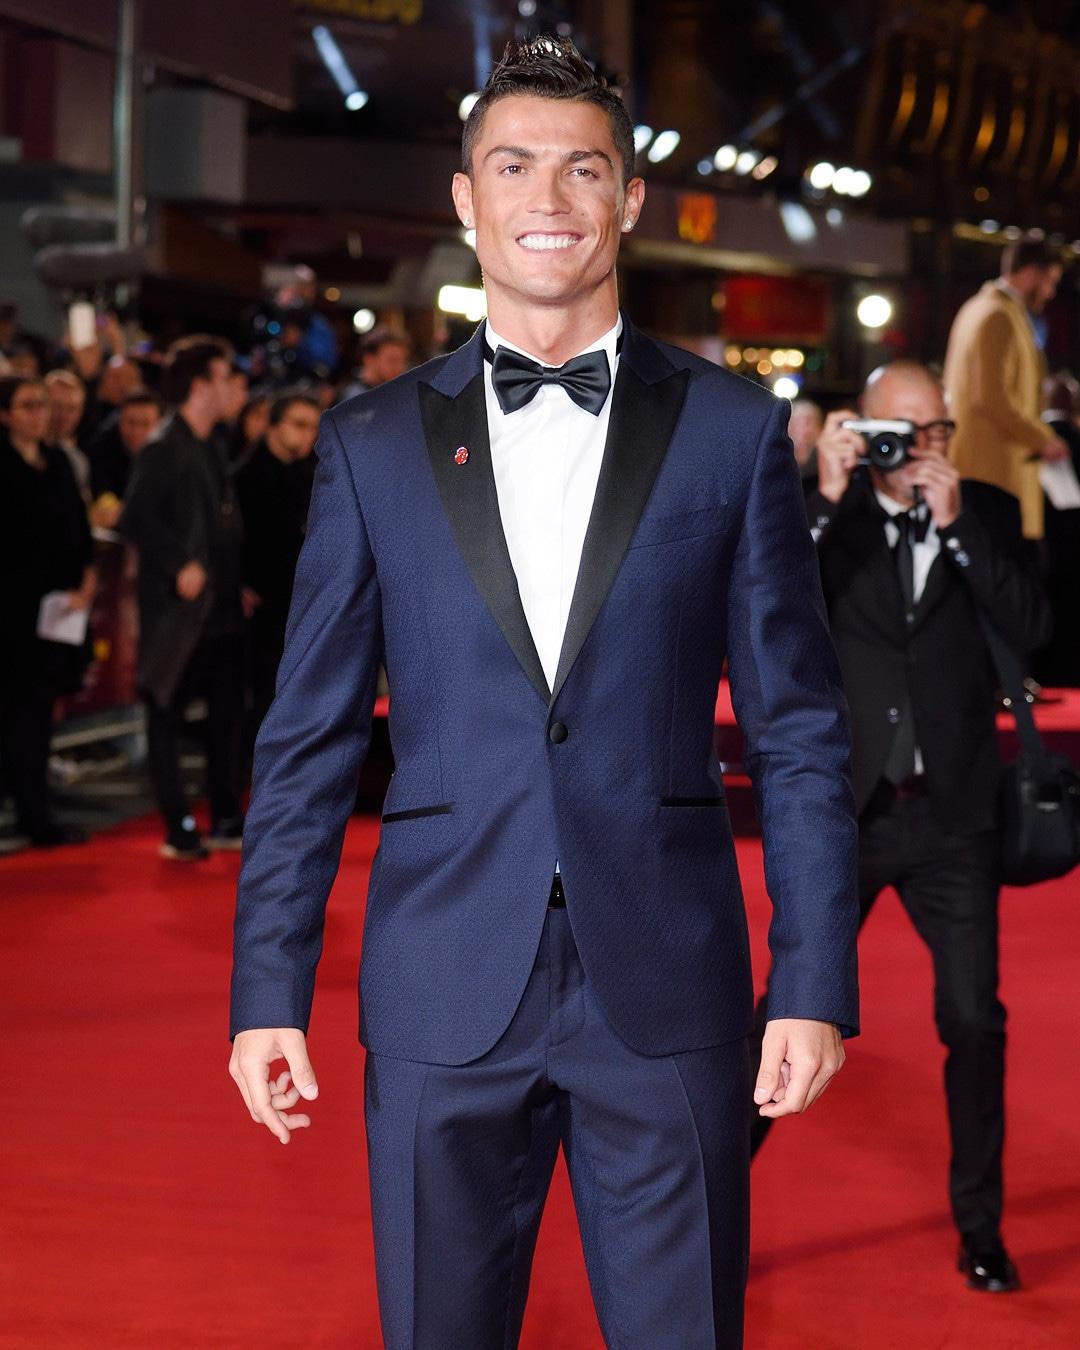 ESC: Stylish Soccer Players, Cristiano Ronaldo, Portugal